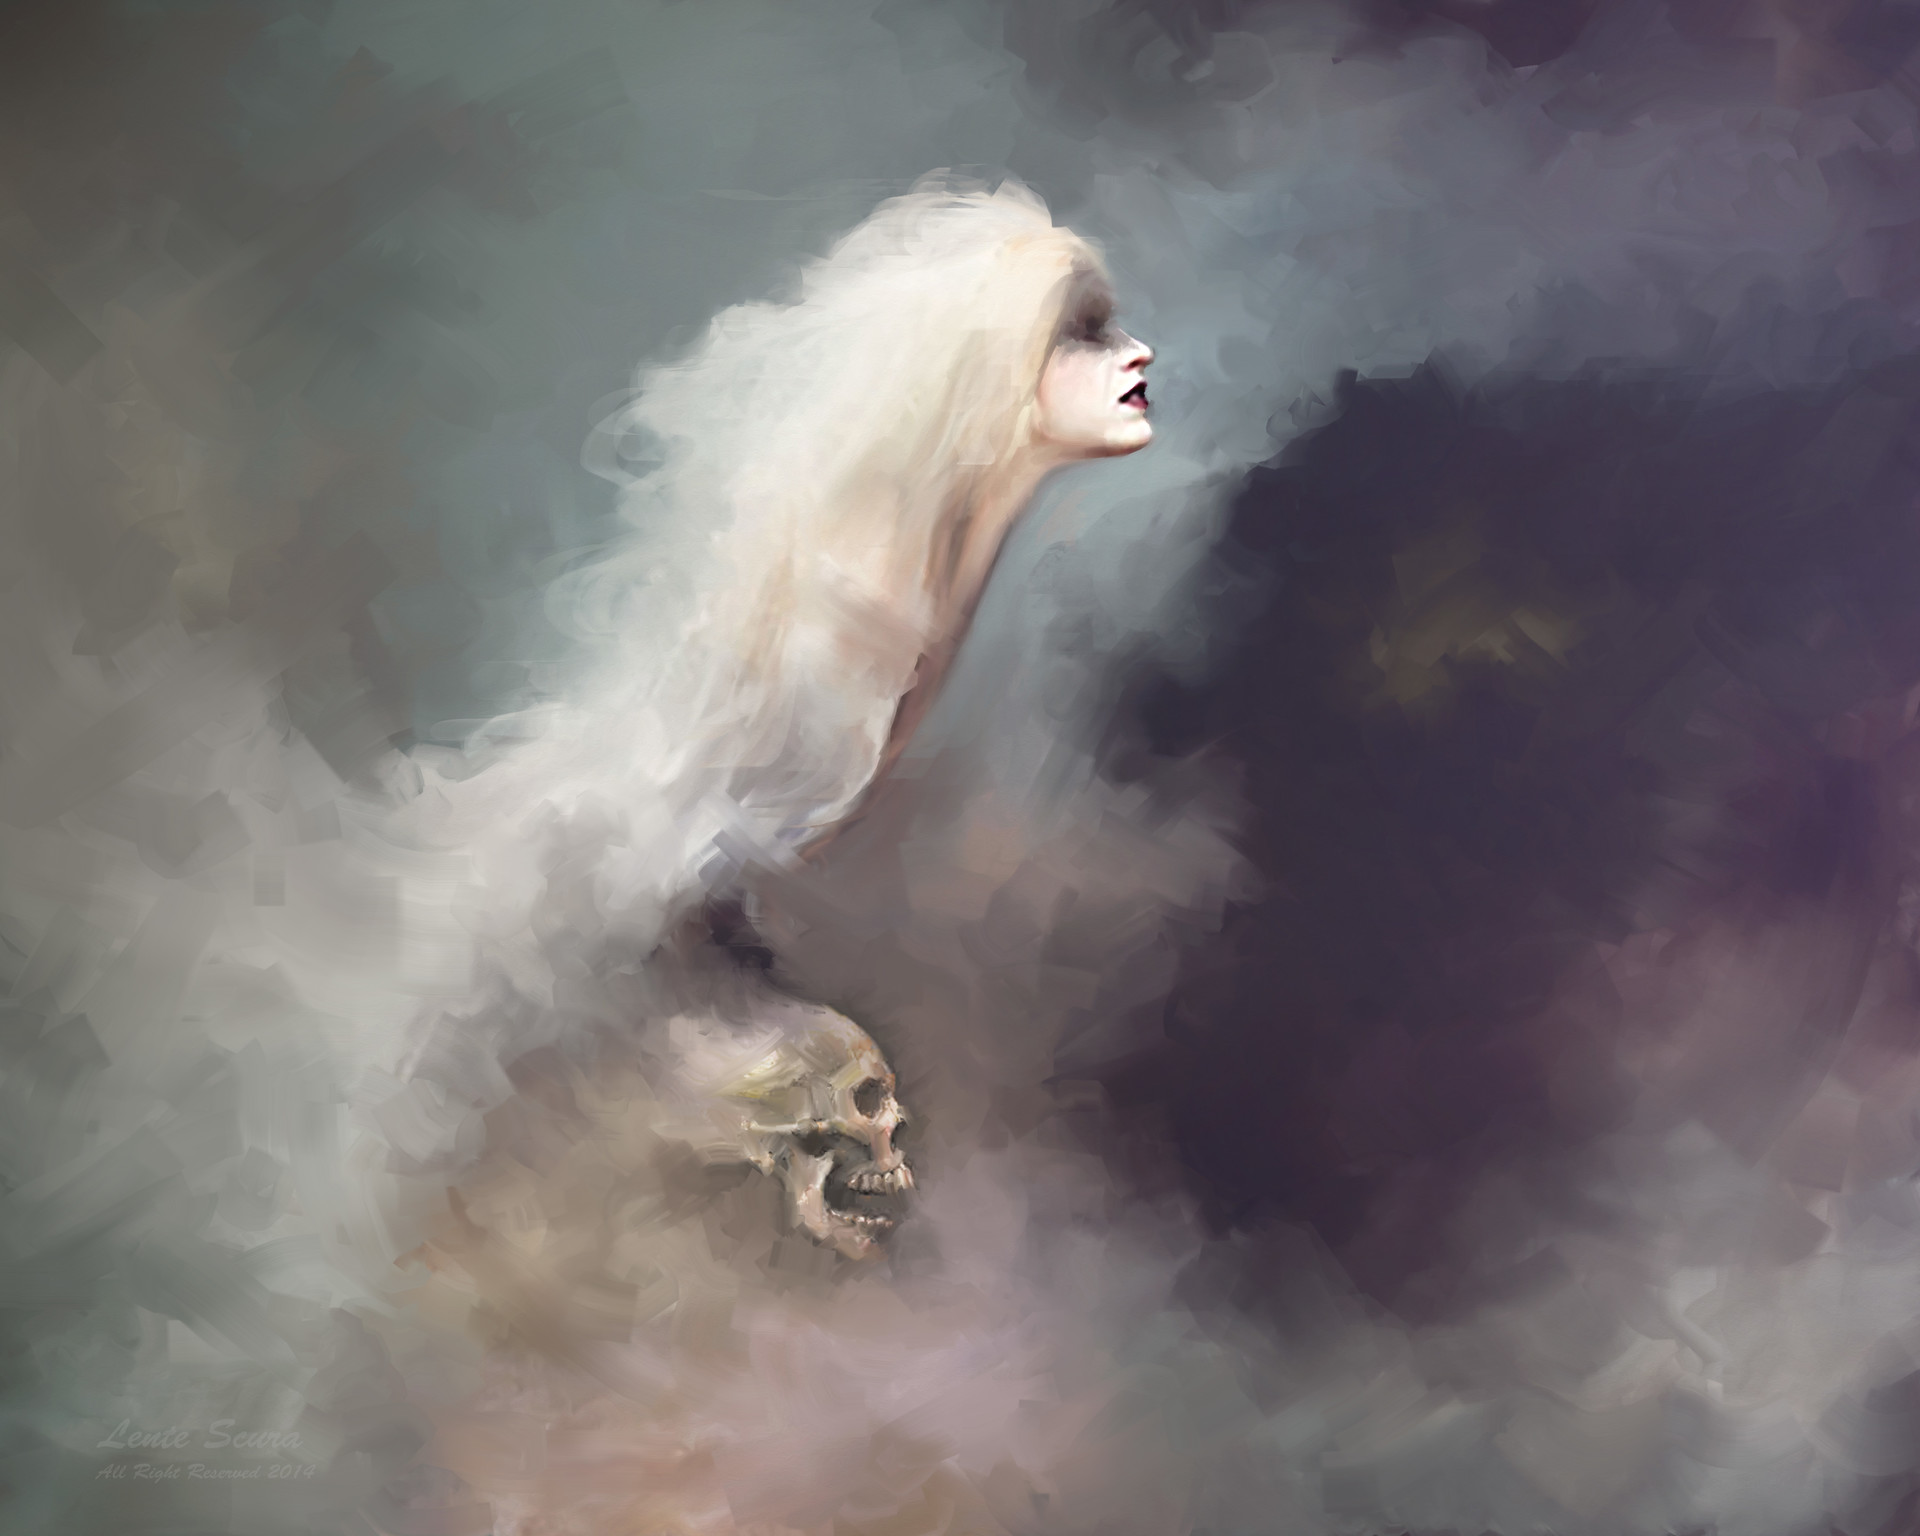 L e n t e s c u r a la regina del sesso e della morte